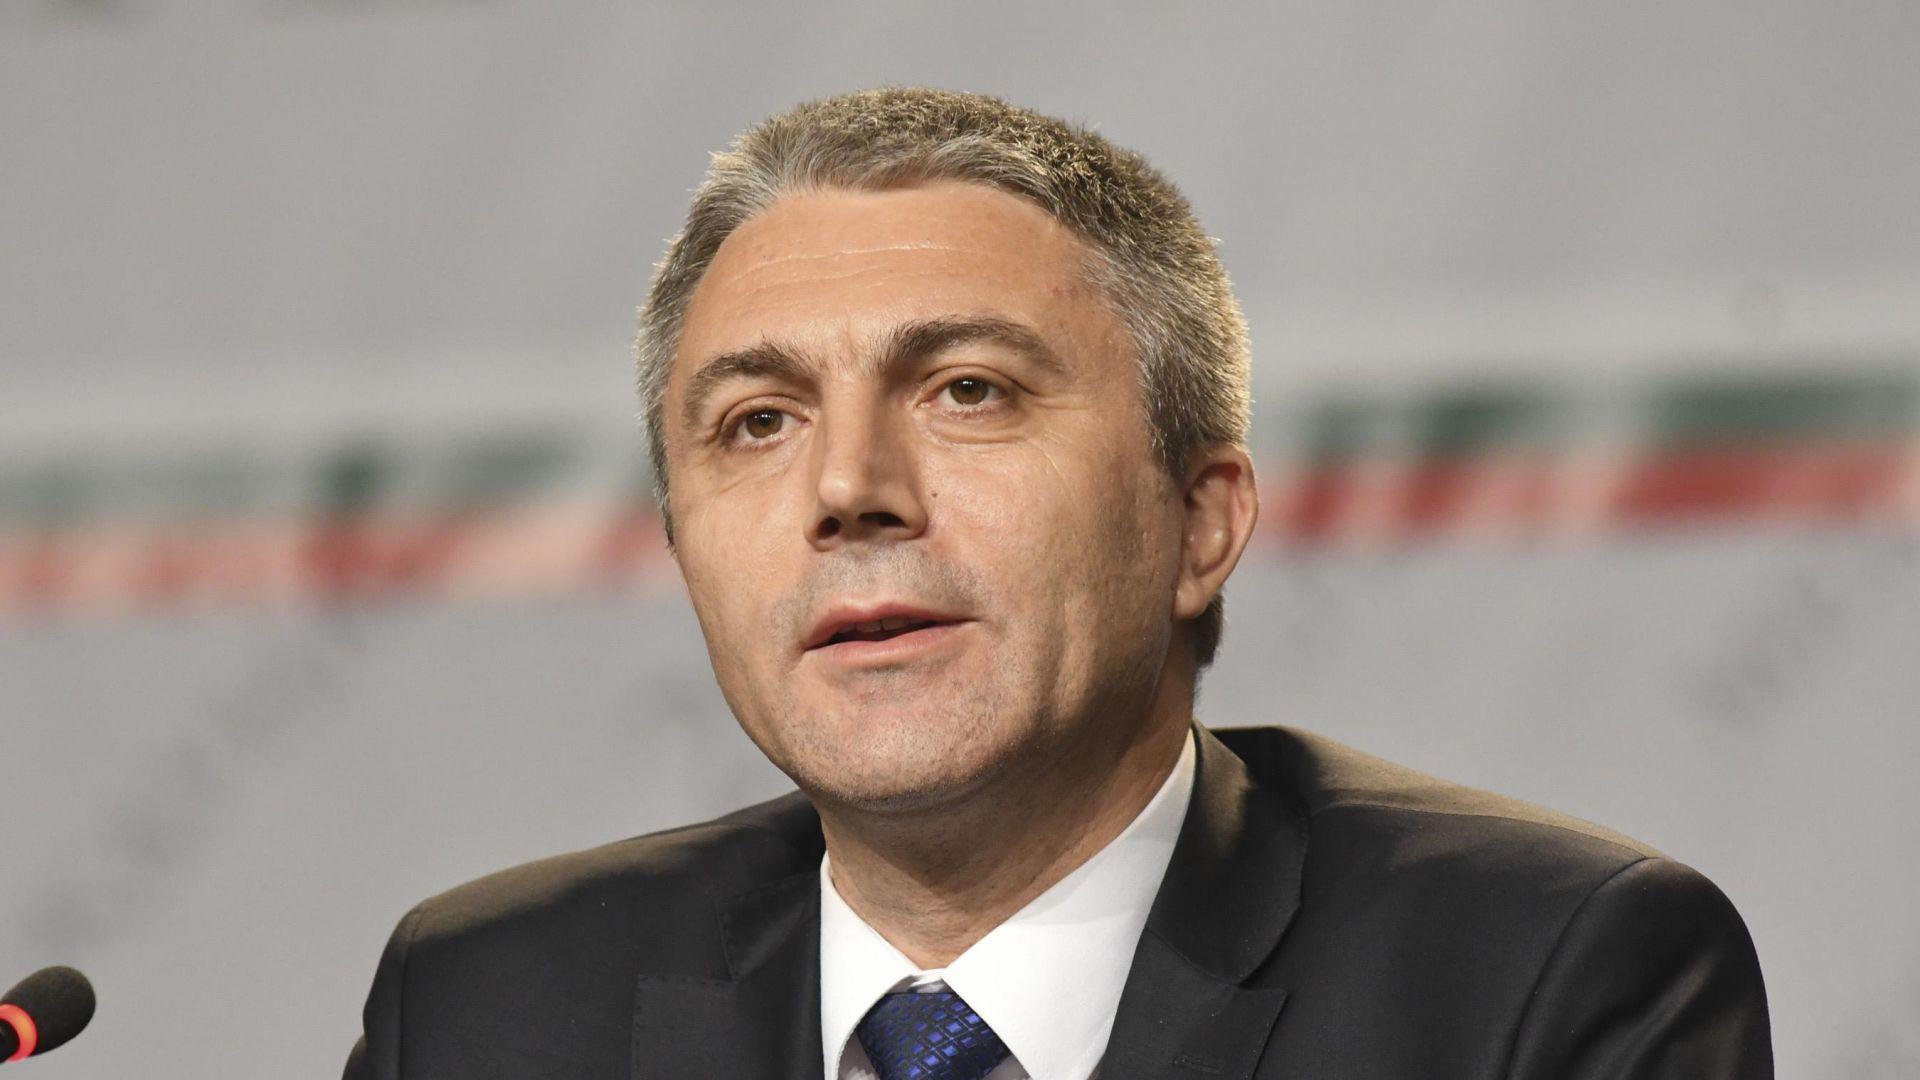 ДПС към Борисов: Какви ги говори Сидеров в Крим